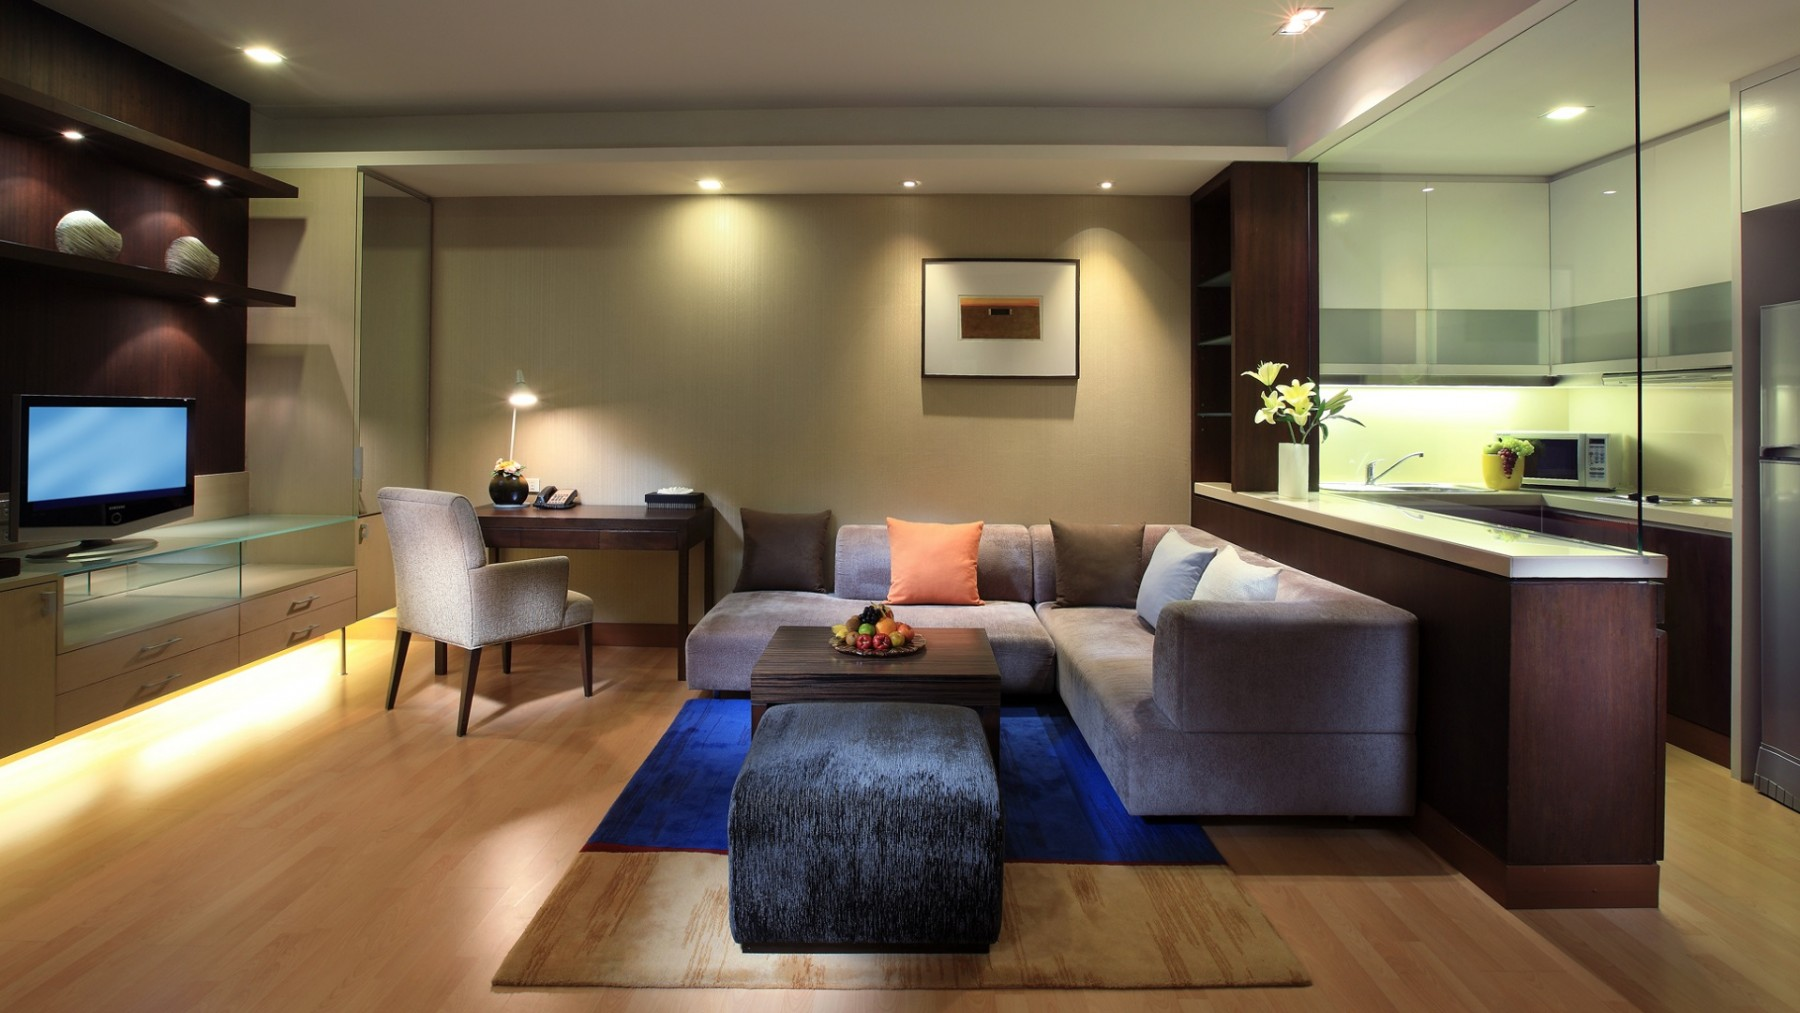 Плюсы и минусы покупки однокомнатных квартир